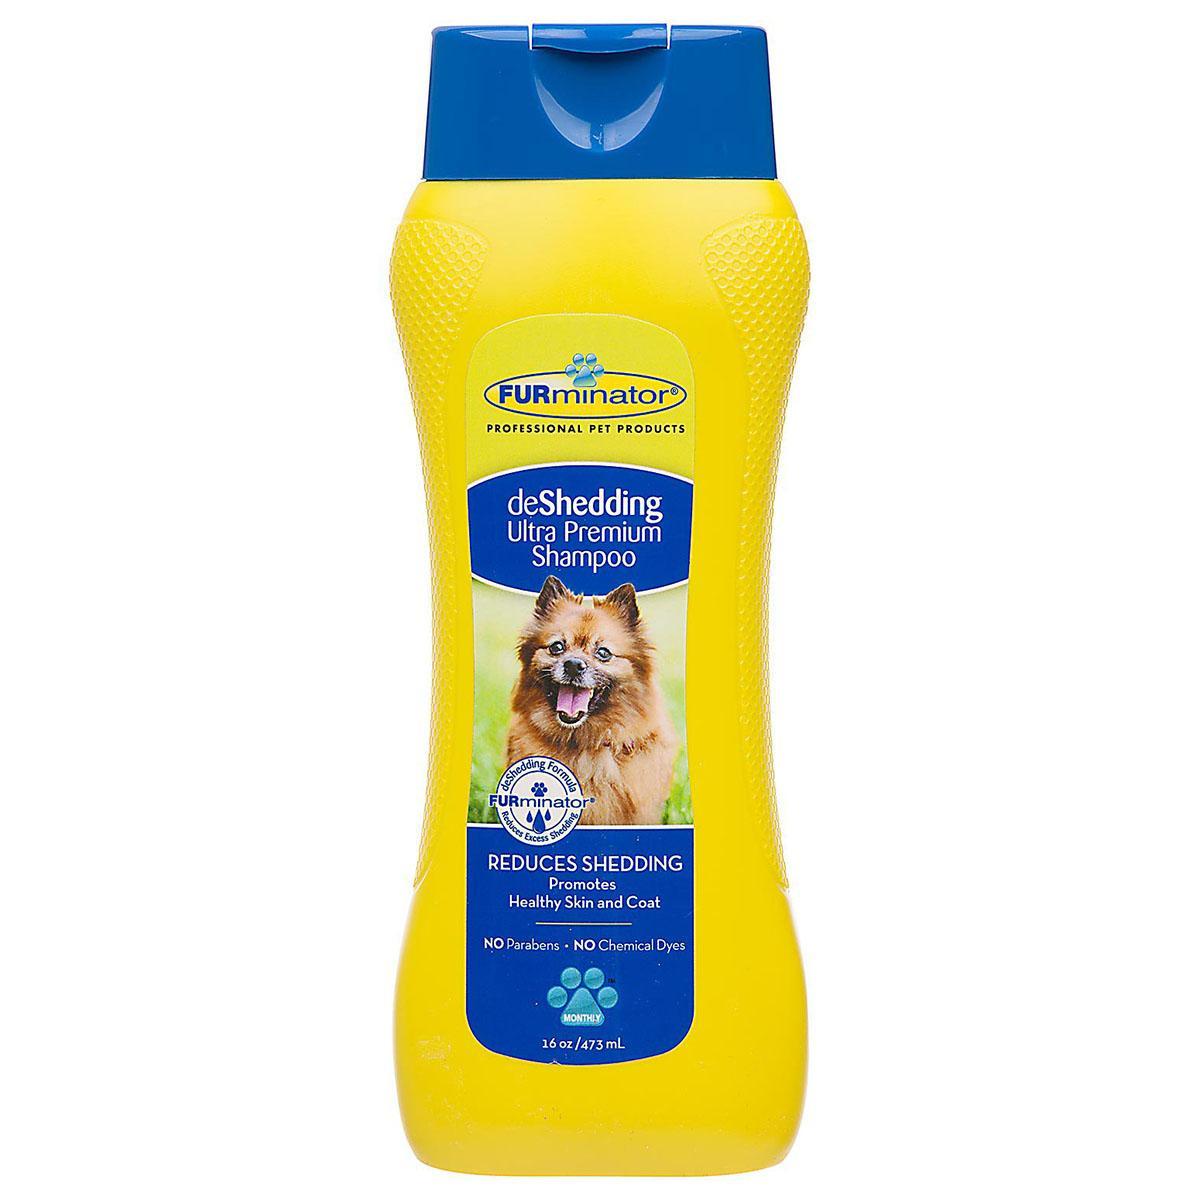 Ultra Premium DeShedding Pet Shampoo by FURminator